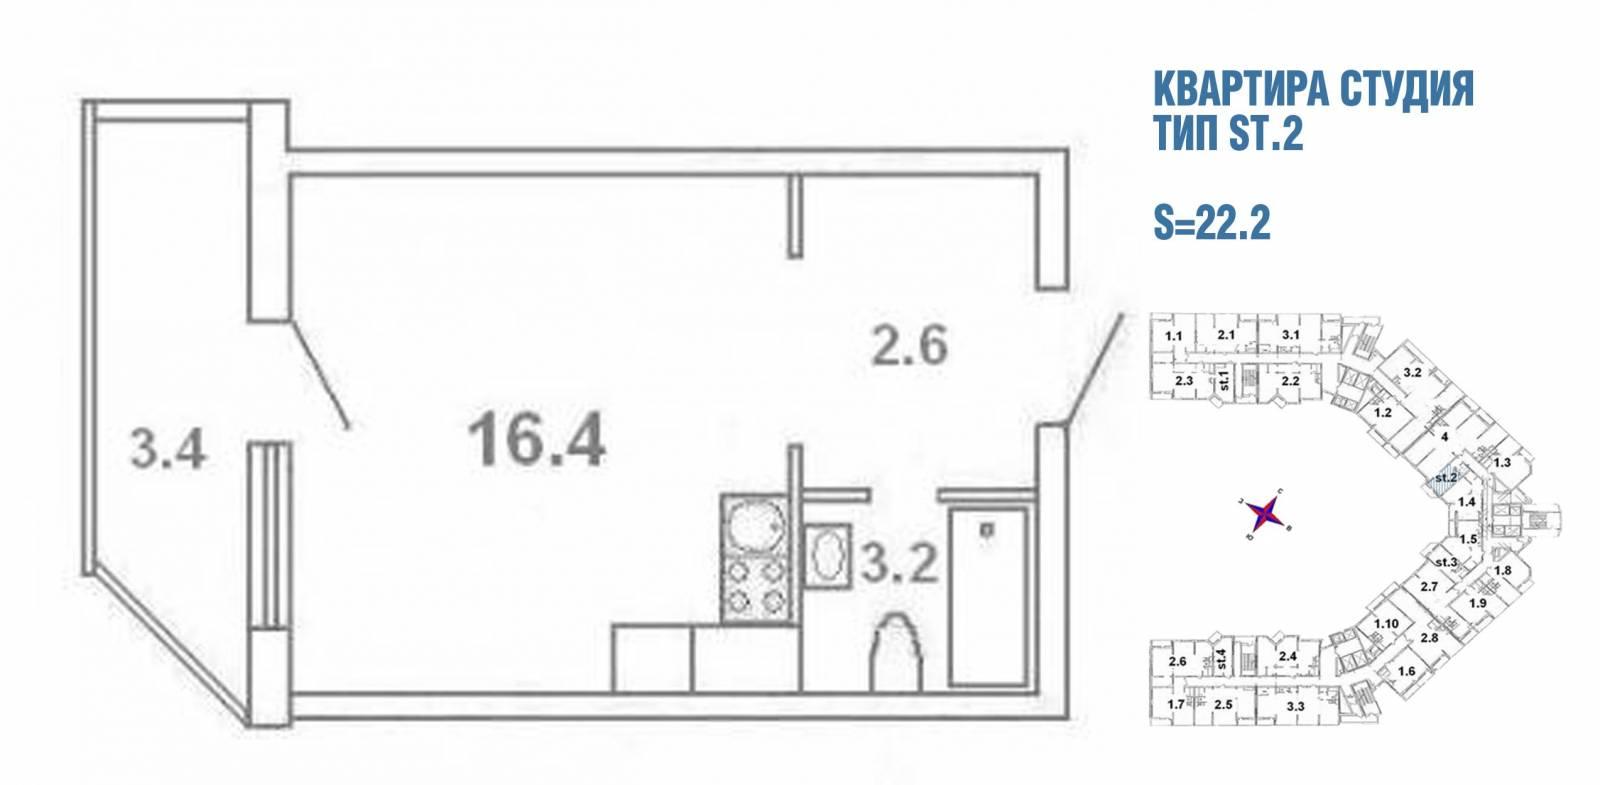 Квартира студия тип st.2 - 22,2 кв.м